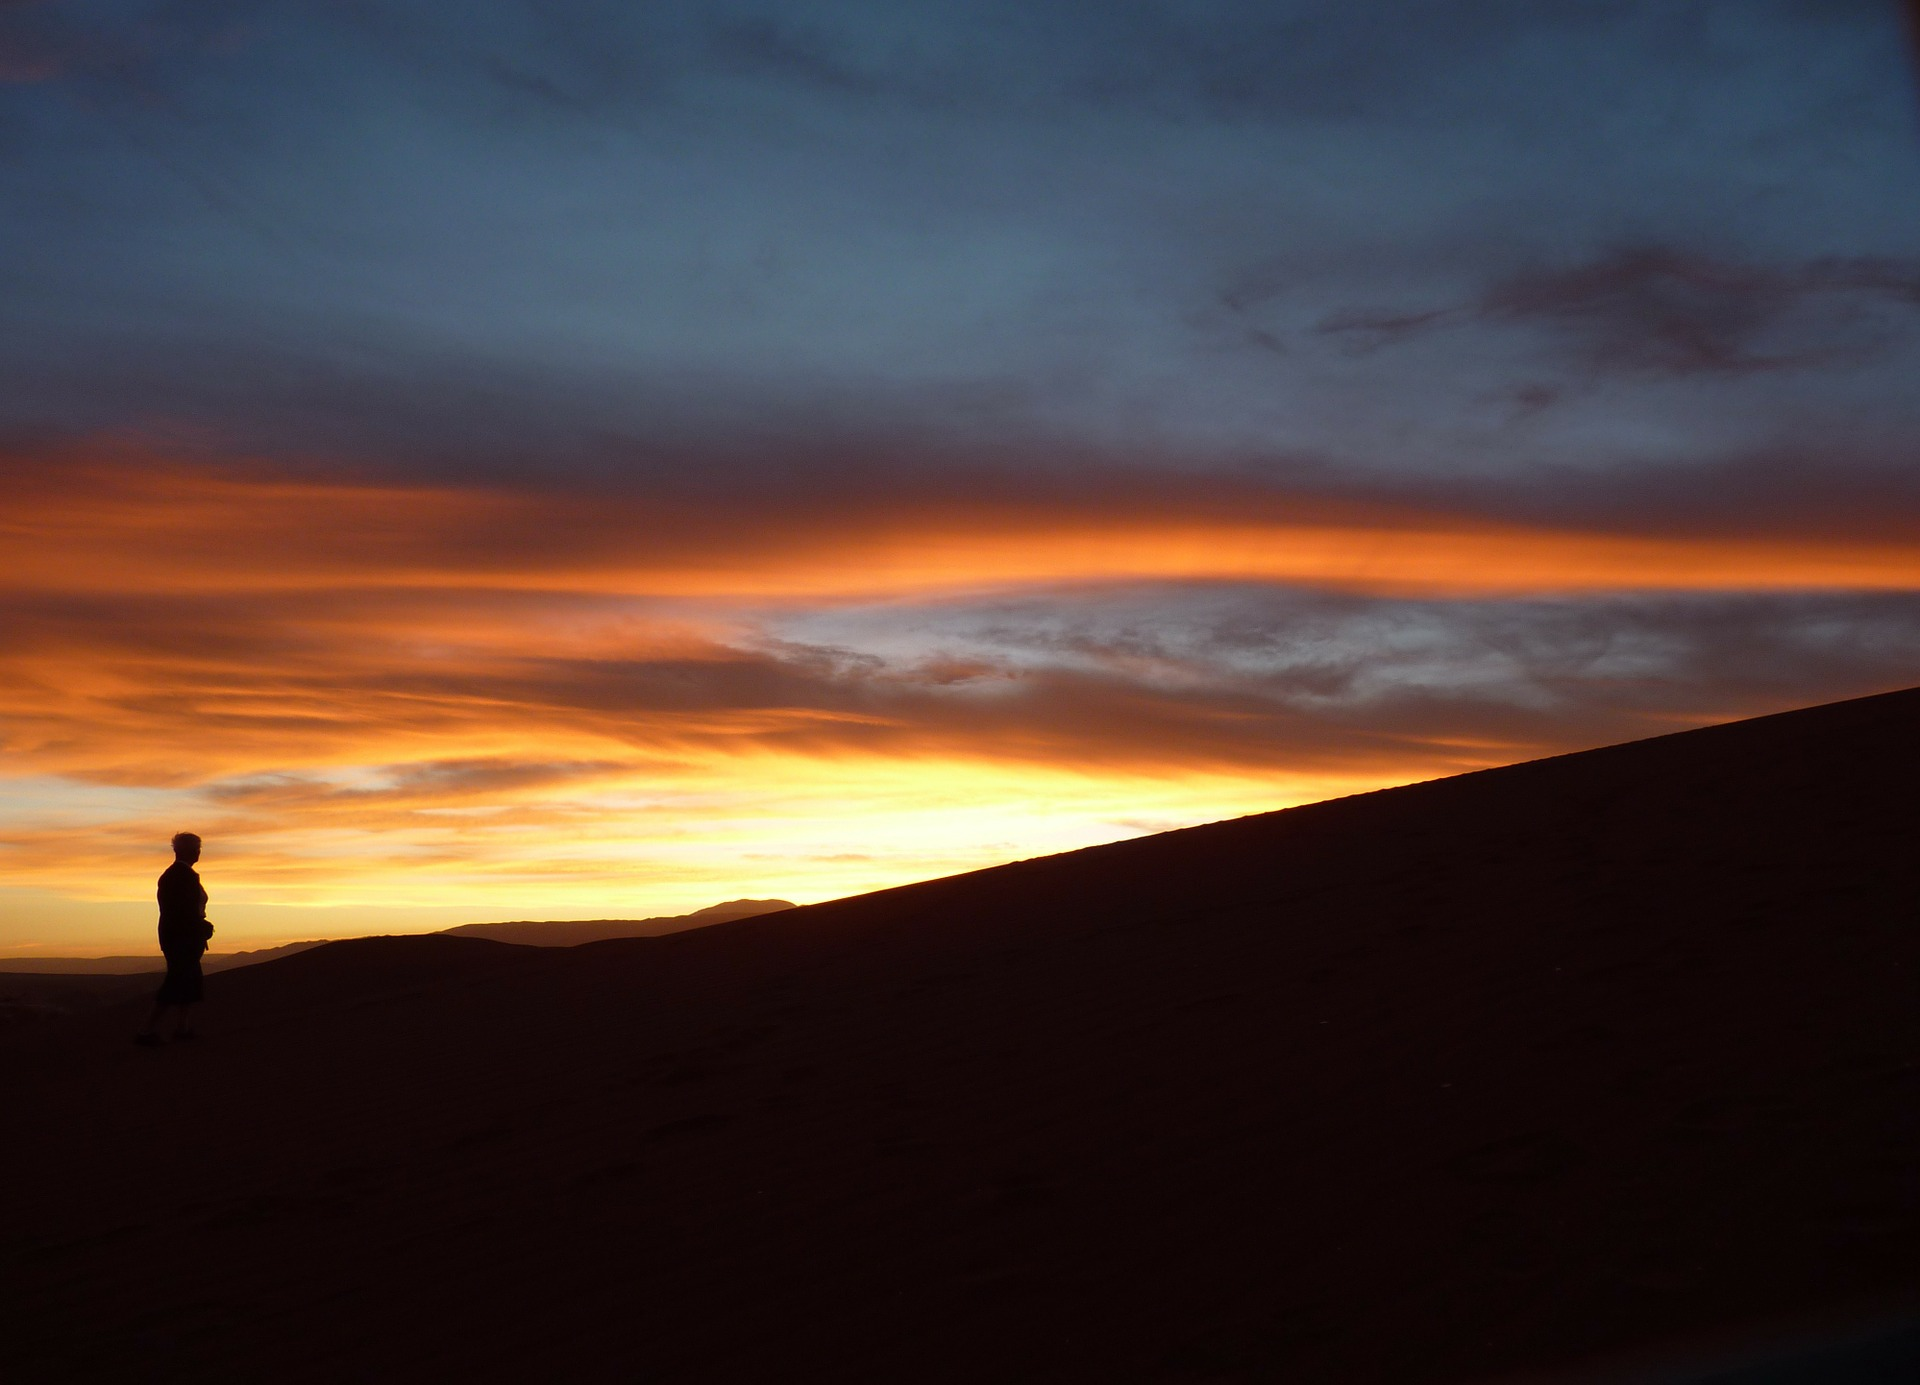 sunset-74778_1920.jpg